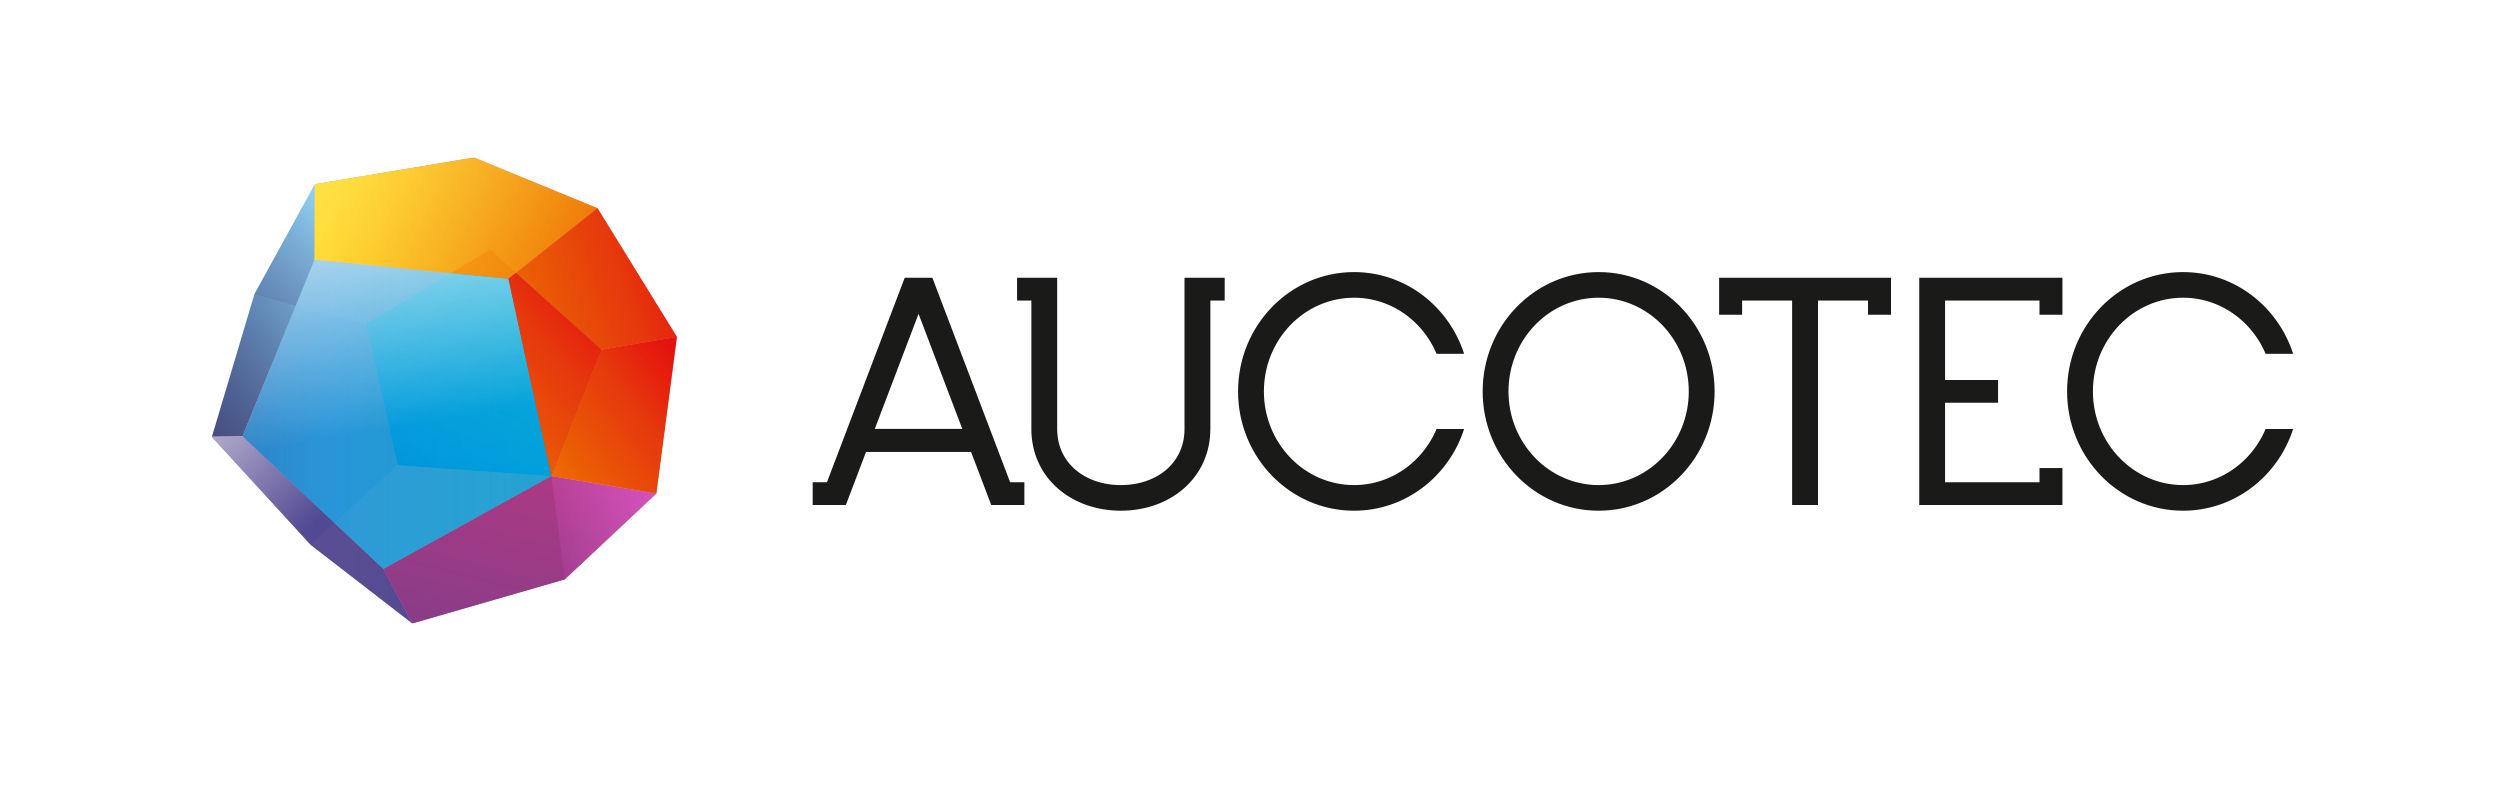 AUCOTEC AG